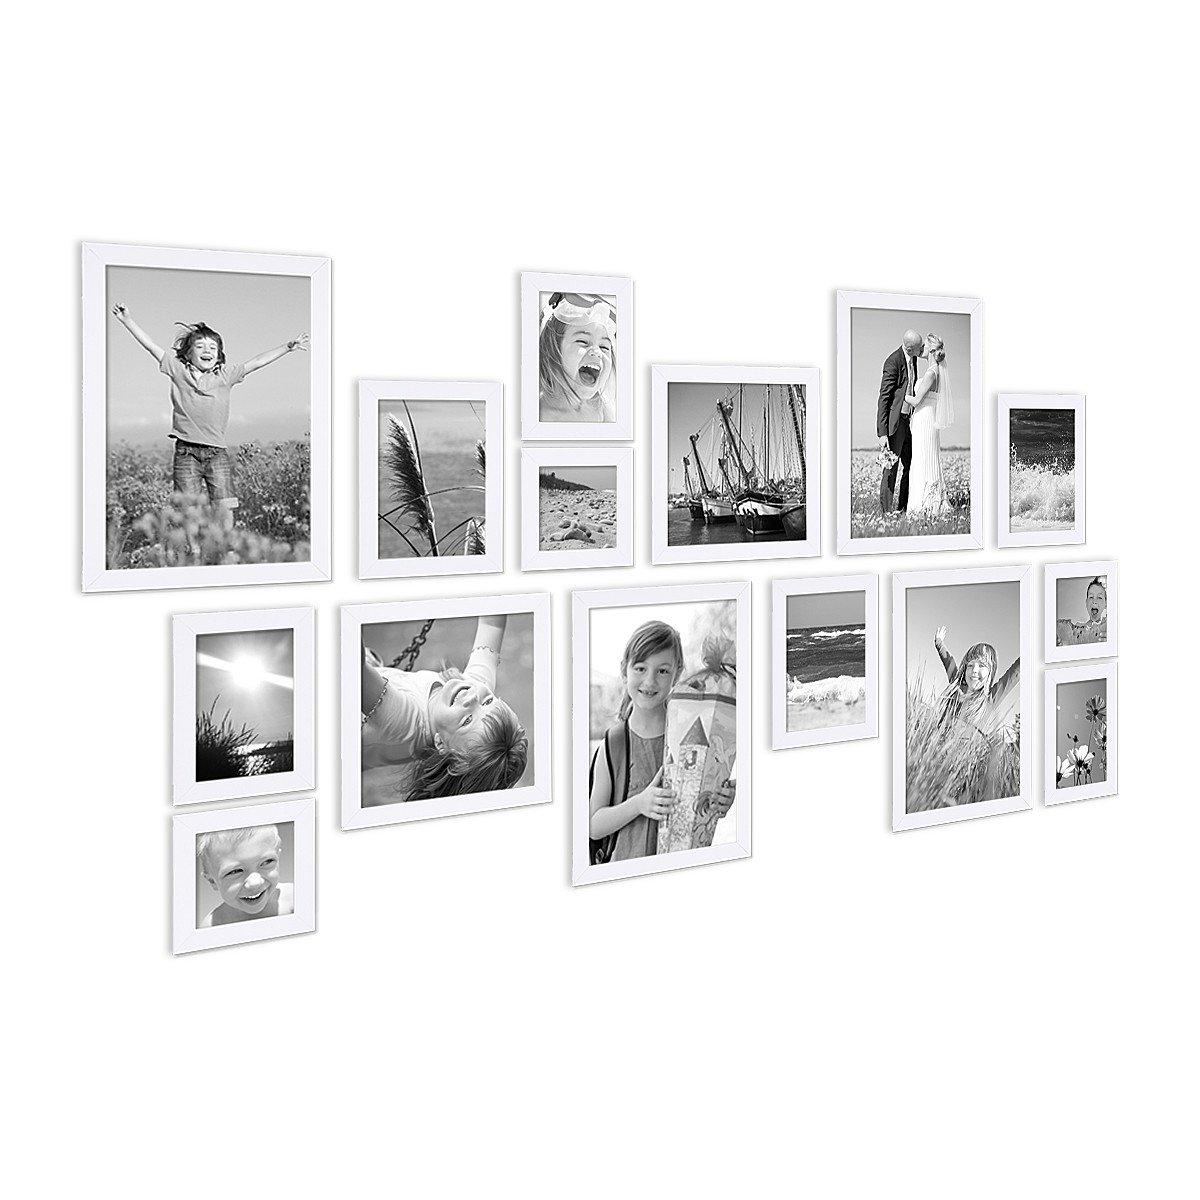 Amazon.de: Photolini 15er Set Bilderrahmen Modern Weiss aus MDF ...